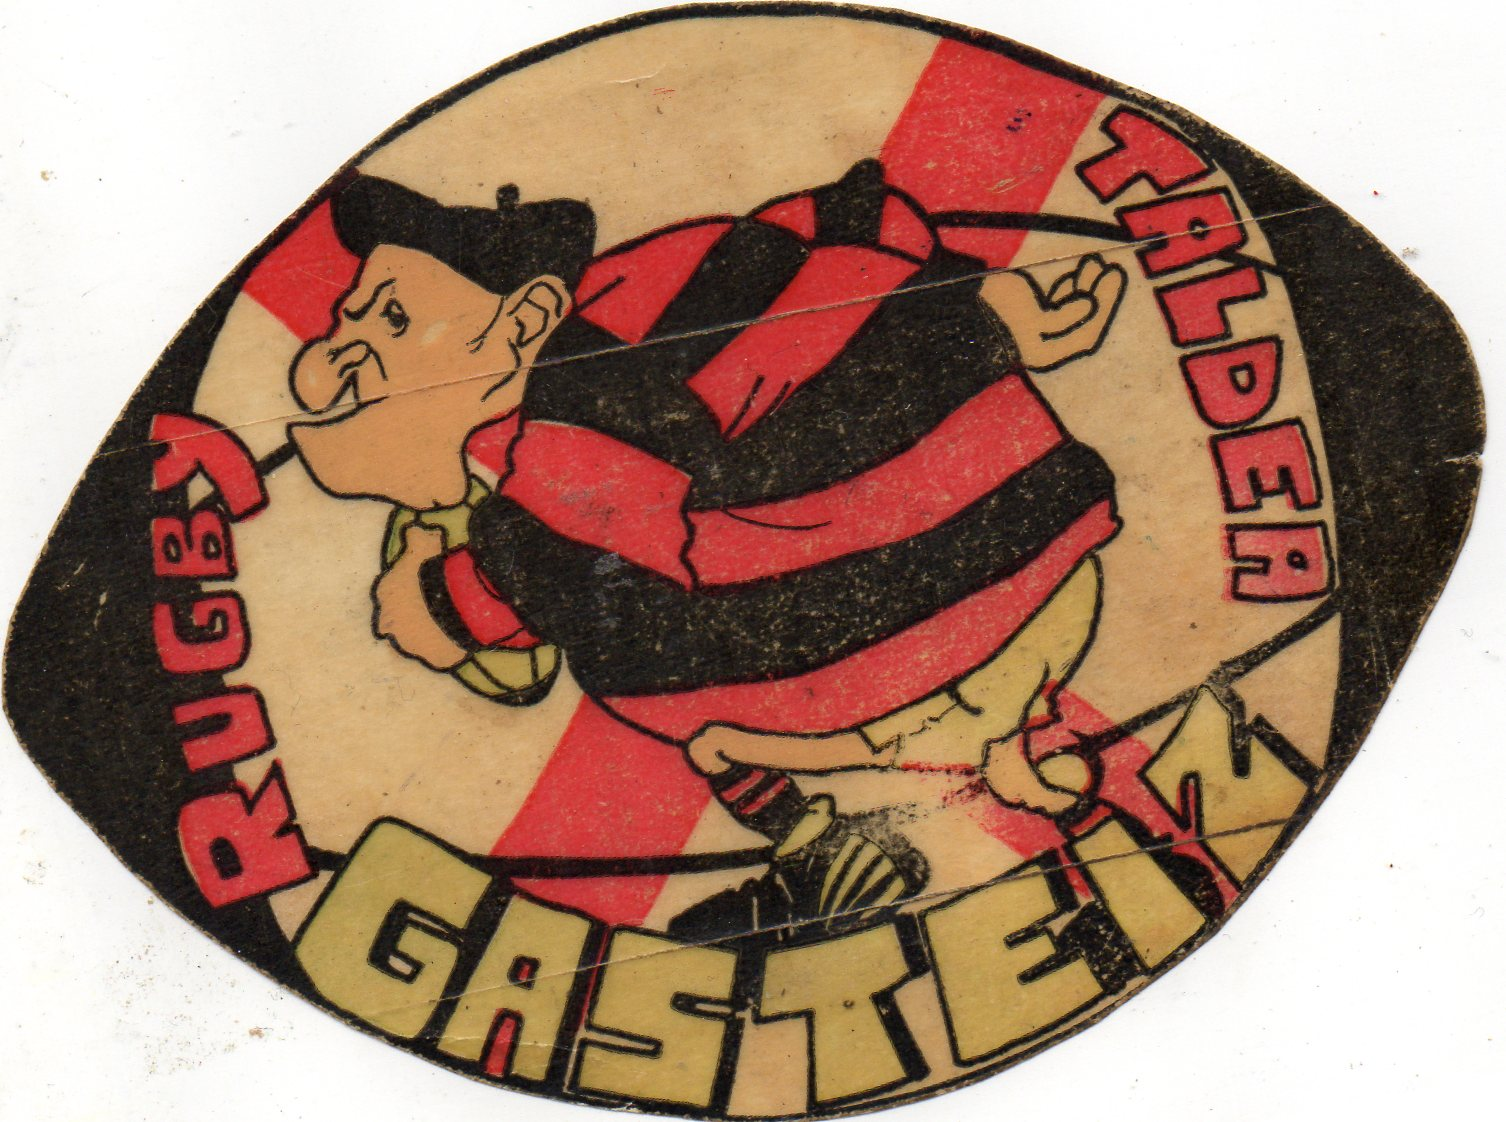 GASTEIZ RUGBY TALDEA